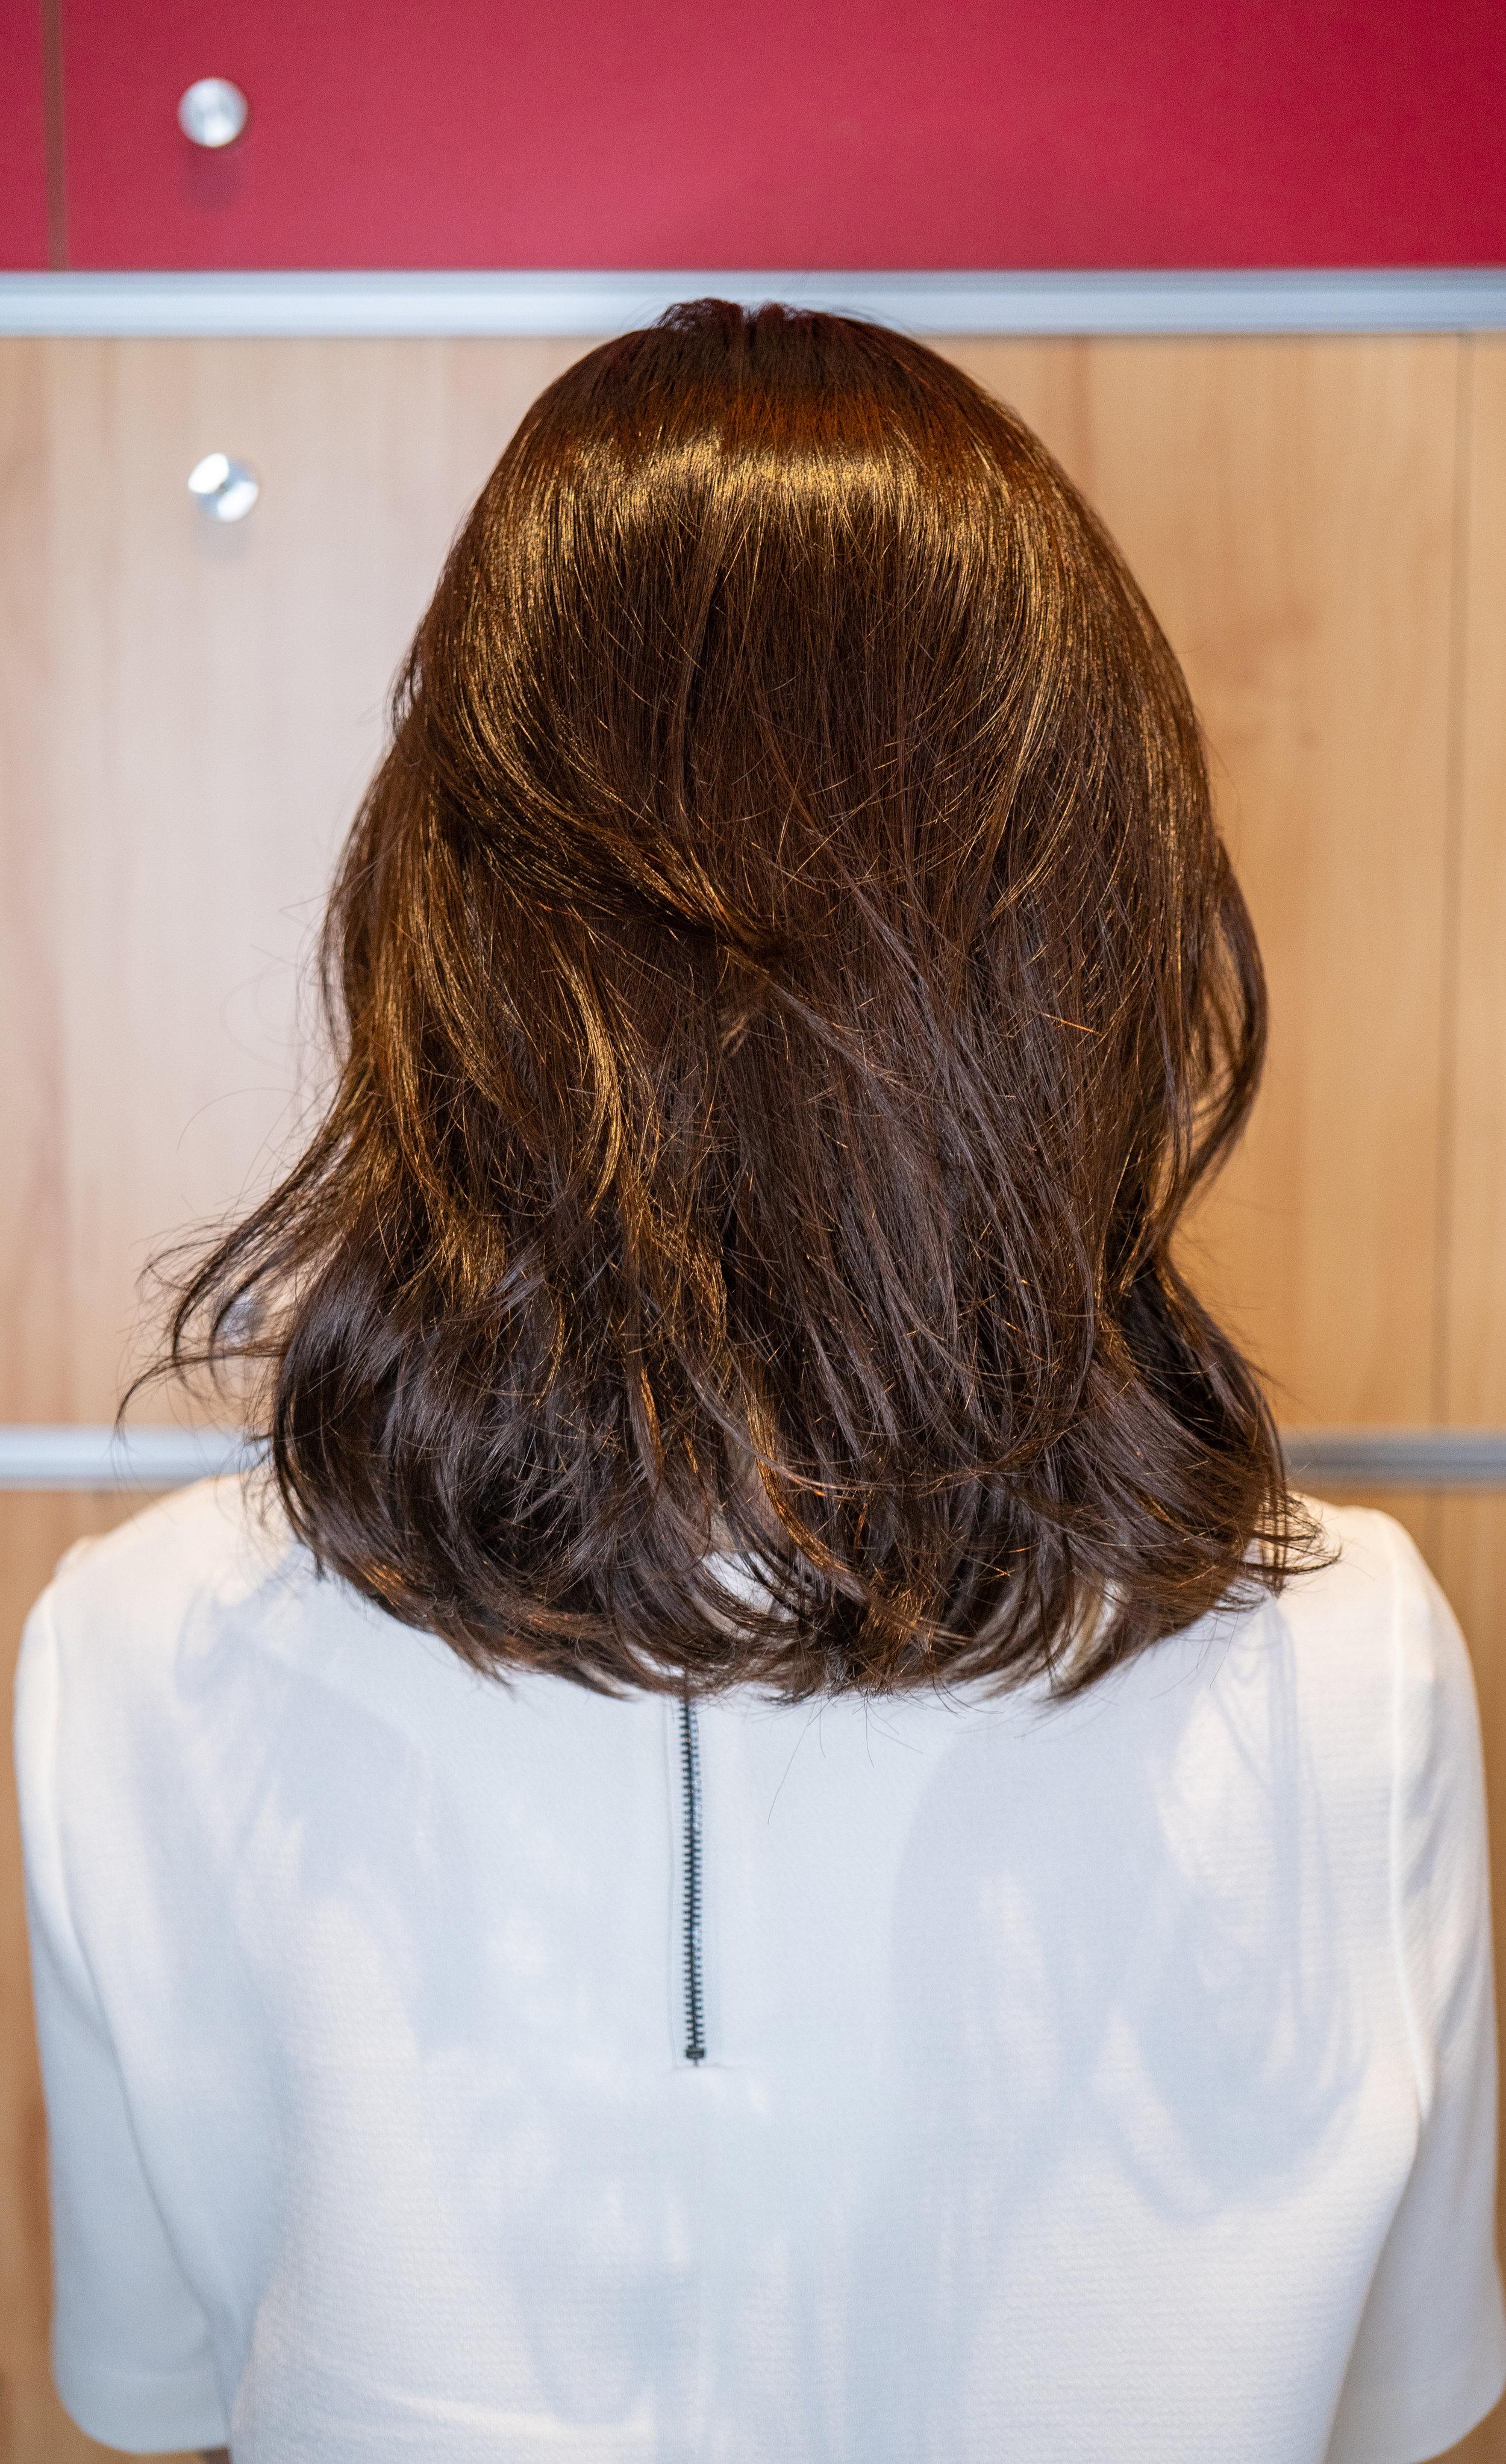 Shiny and smooth permed hair by Korean hairstylist Matthew Kim at DuSol Beauty Novena